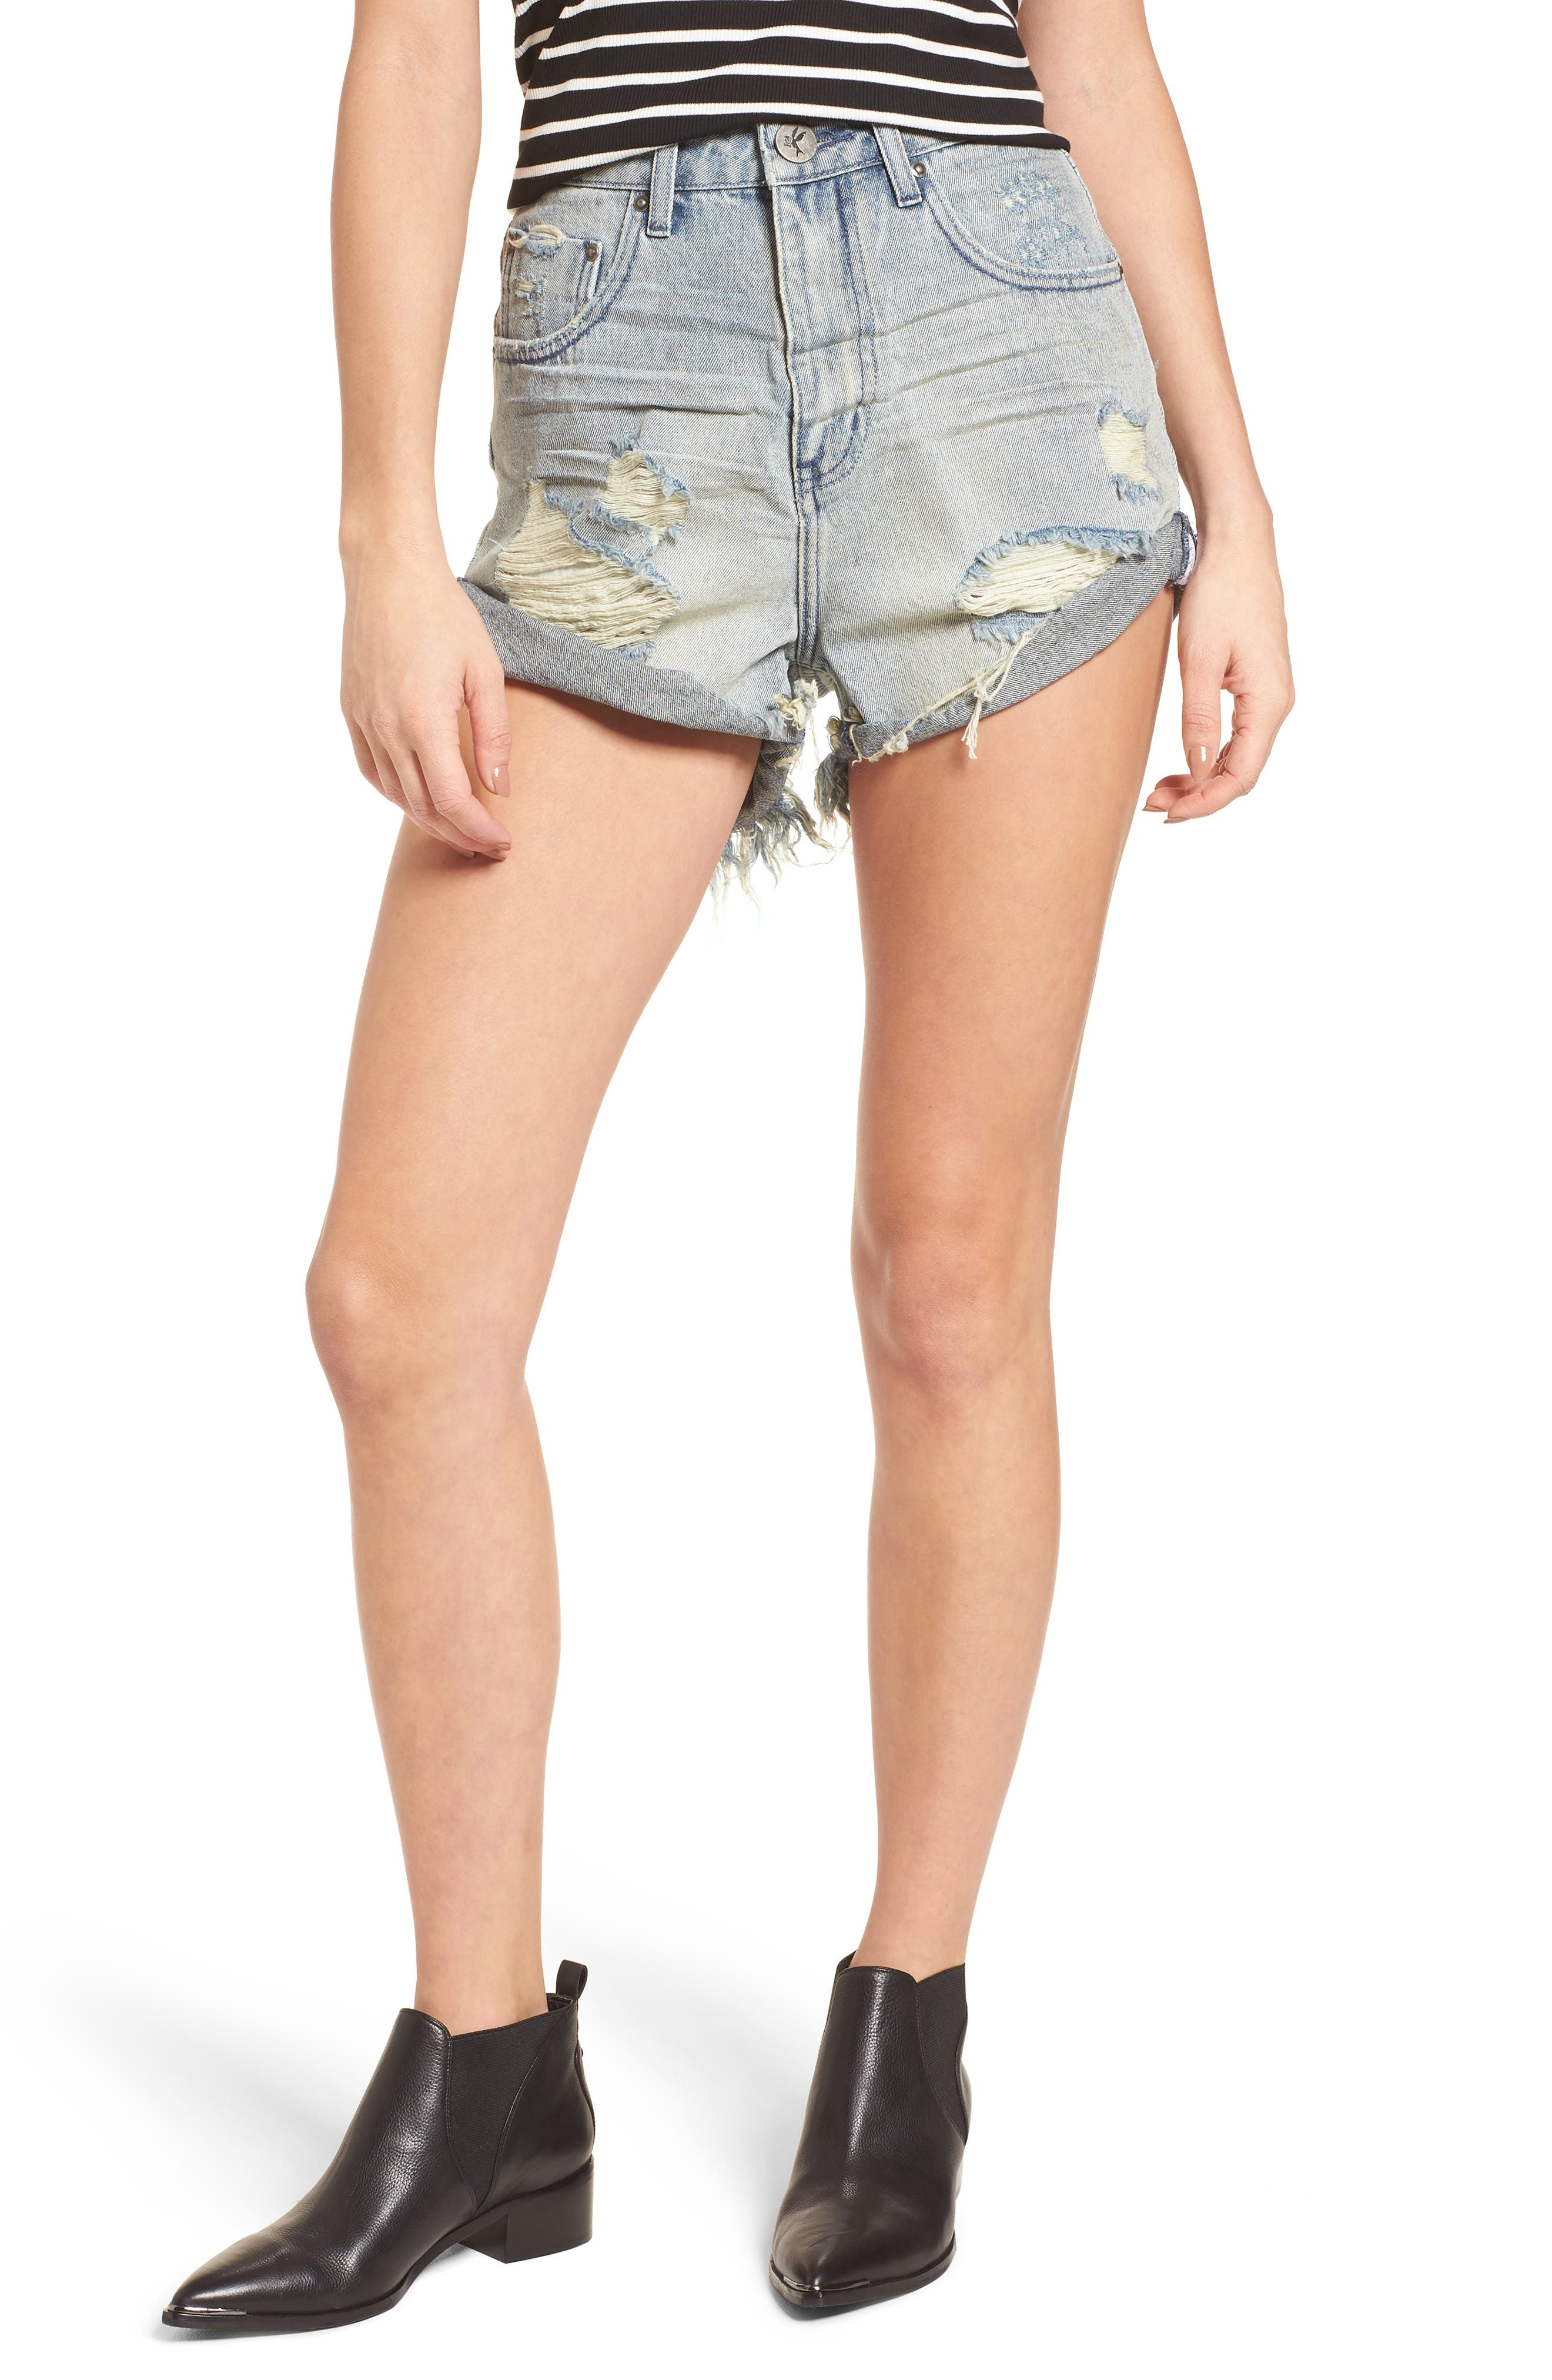 Bandit Ripped High Waist Jean Shorts,                         Main,                         color, Blue Storm